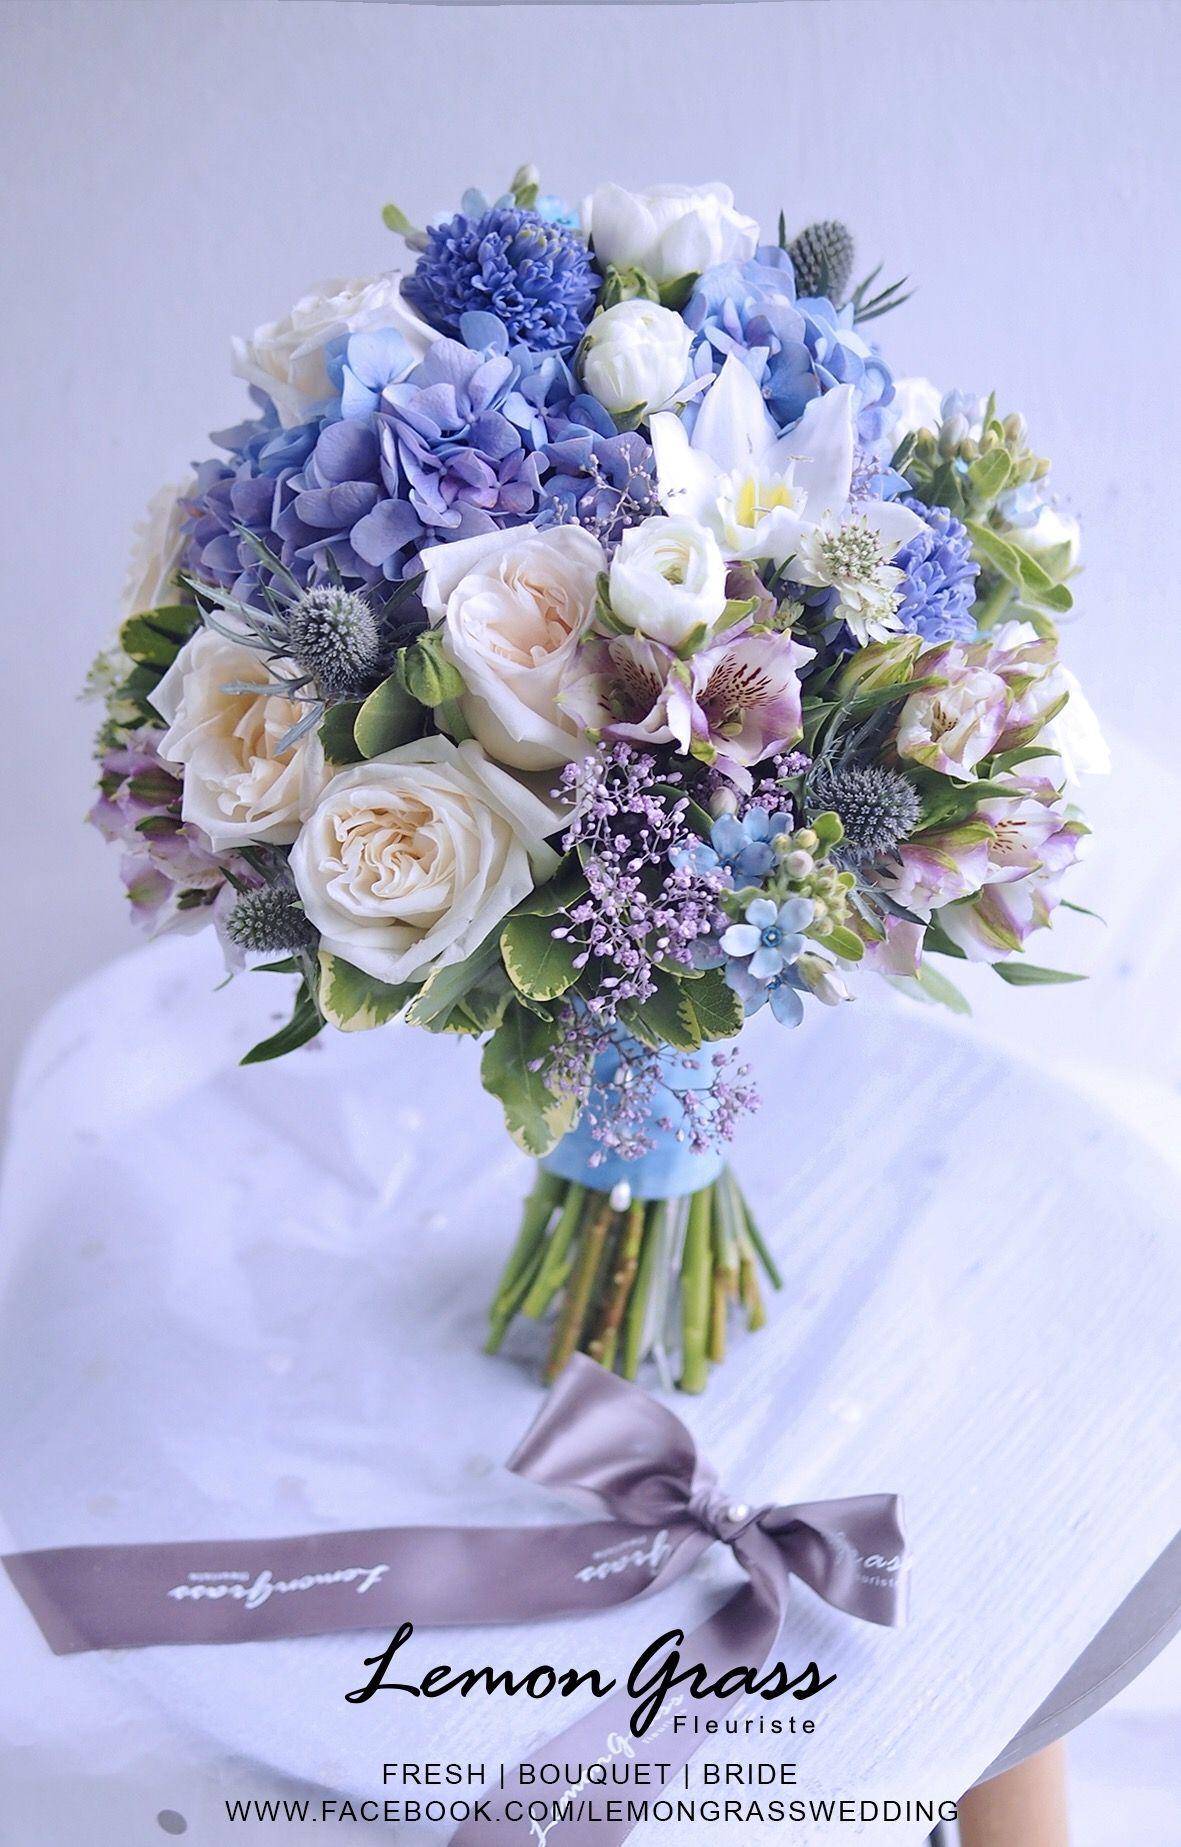 Pin by lemongrasswedding on fresh flower bouquets pinterest prom flowers flower bouquets bridal flowers bride izmirmasajfo